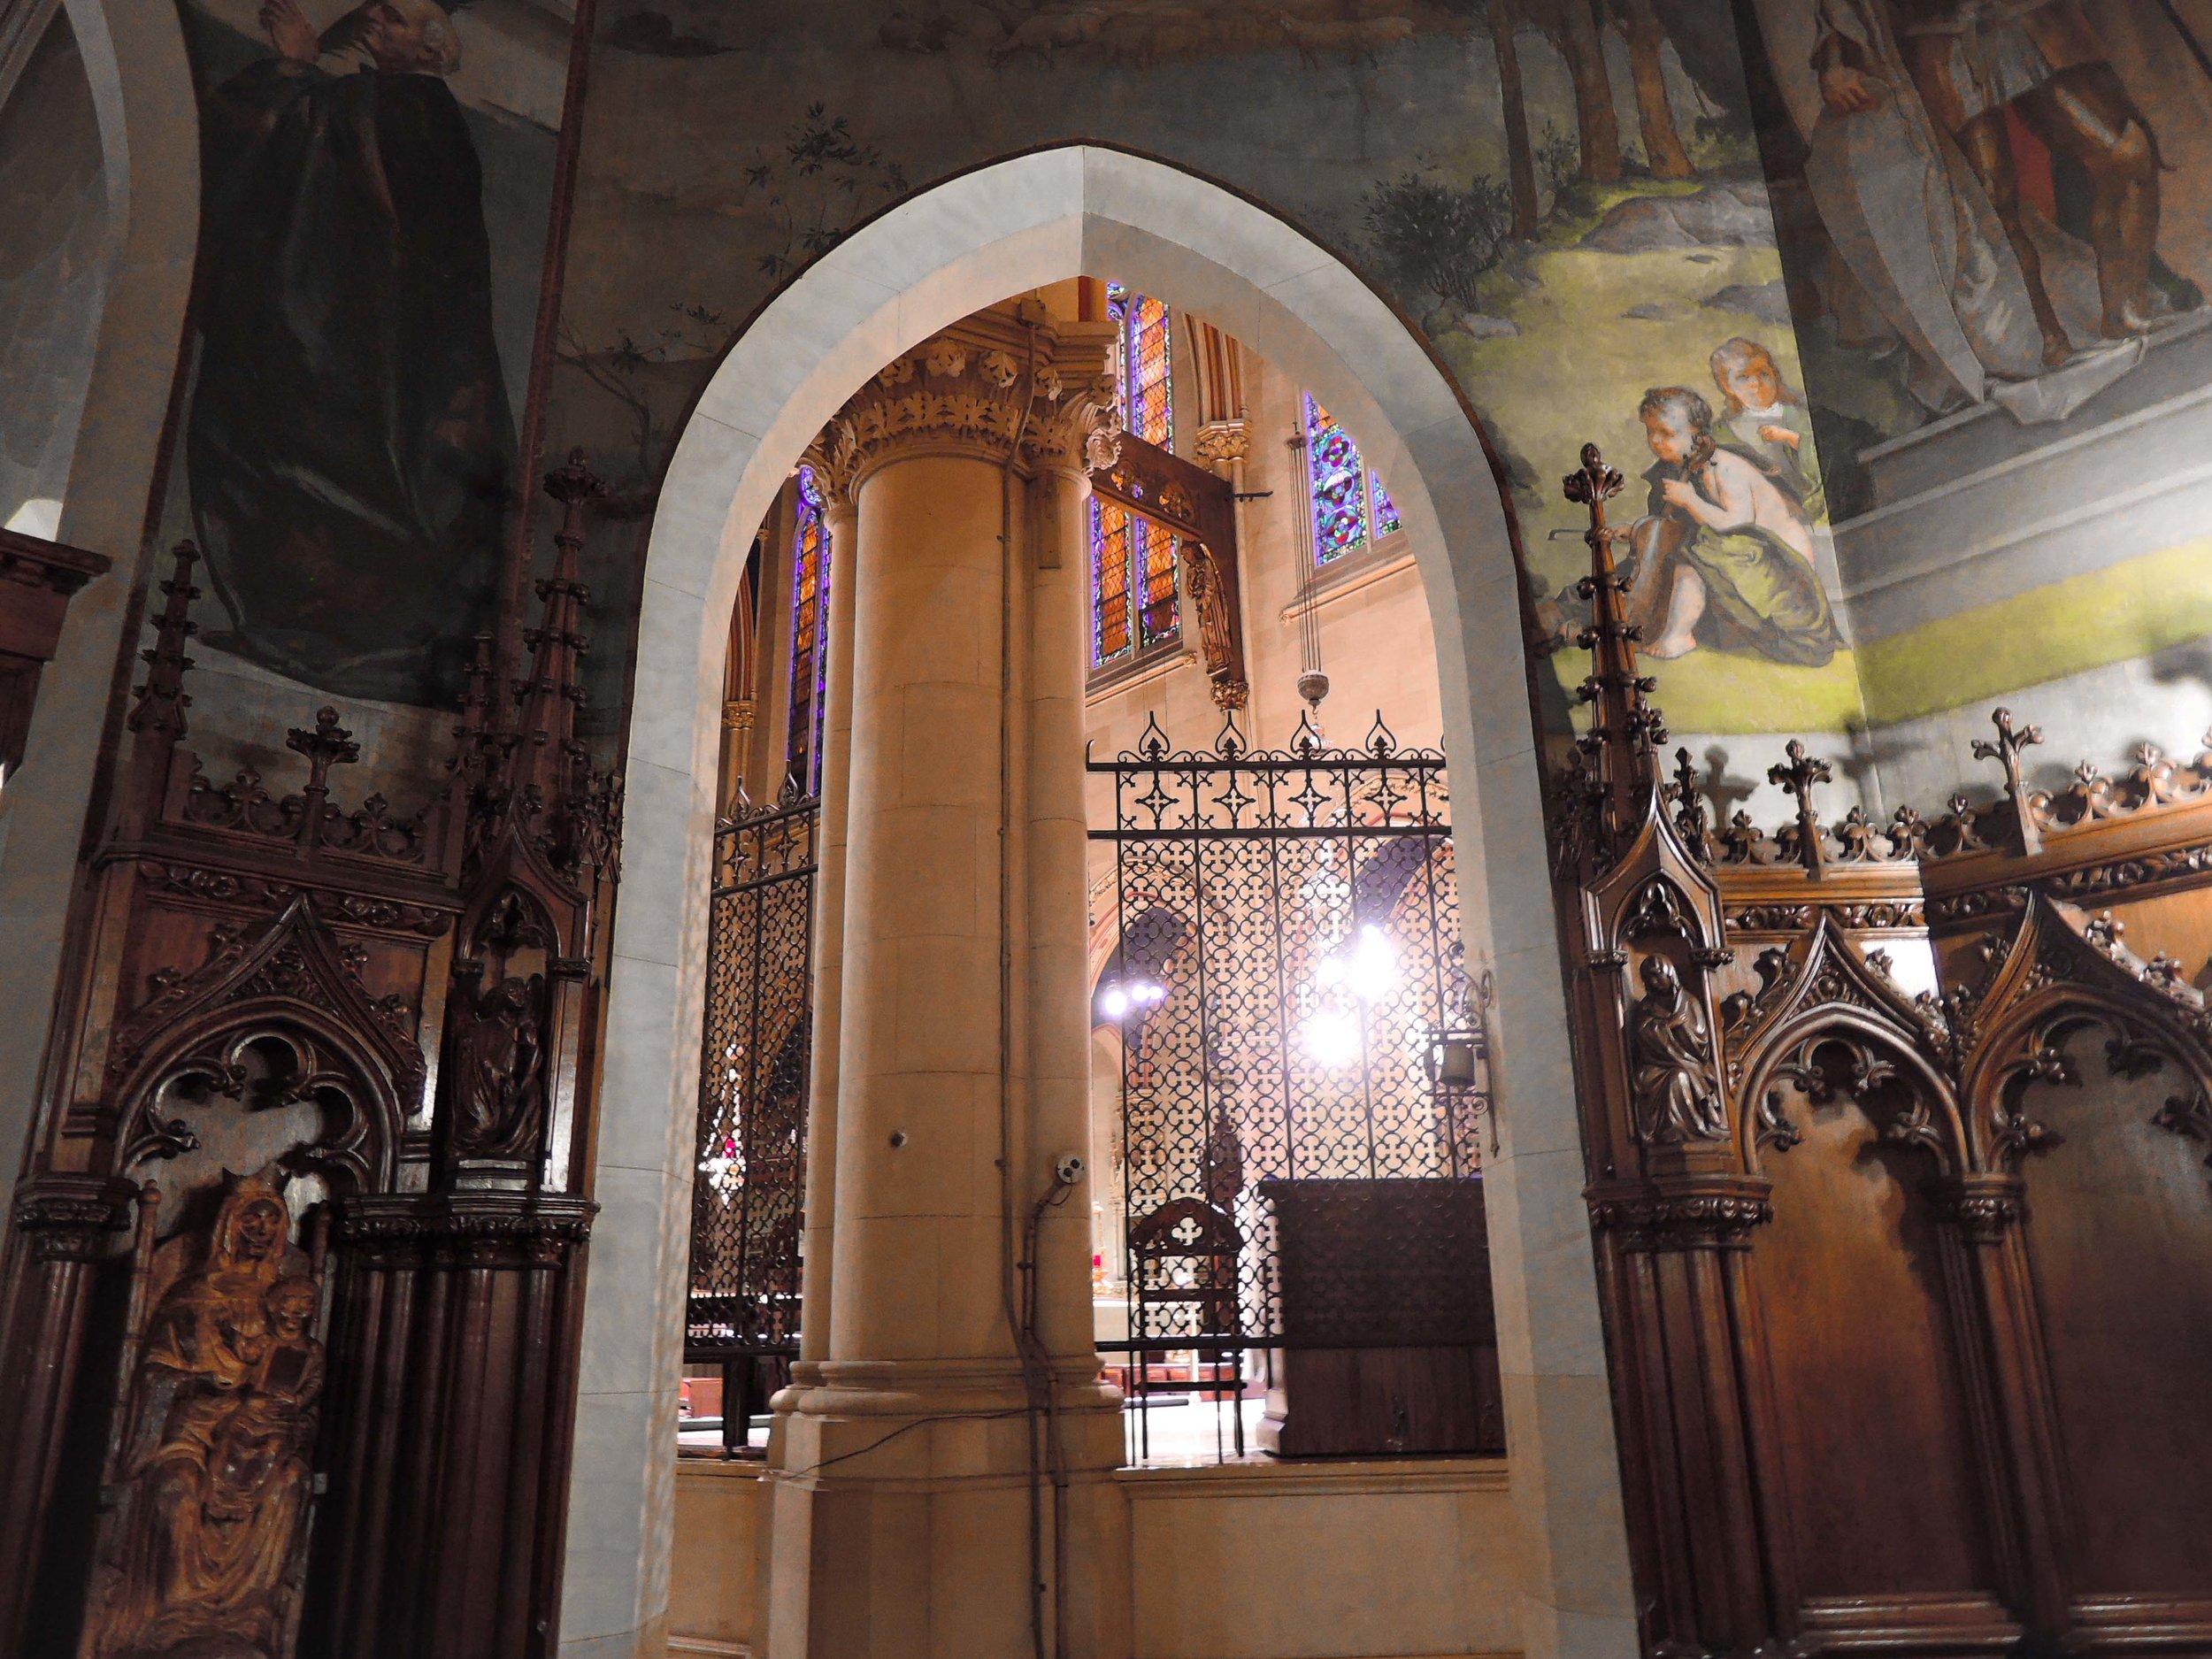 The Lady Chapel looking into the Ambulatory. Elliott Daingerfield's murals in view